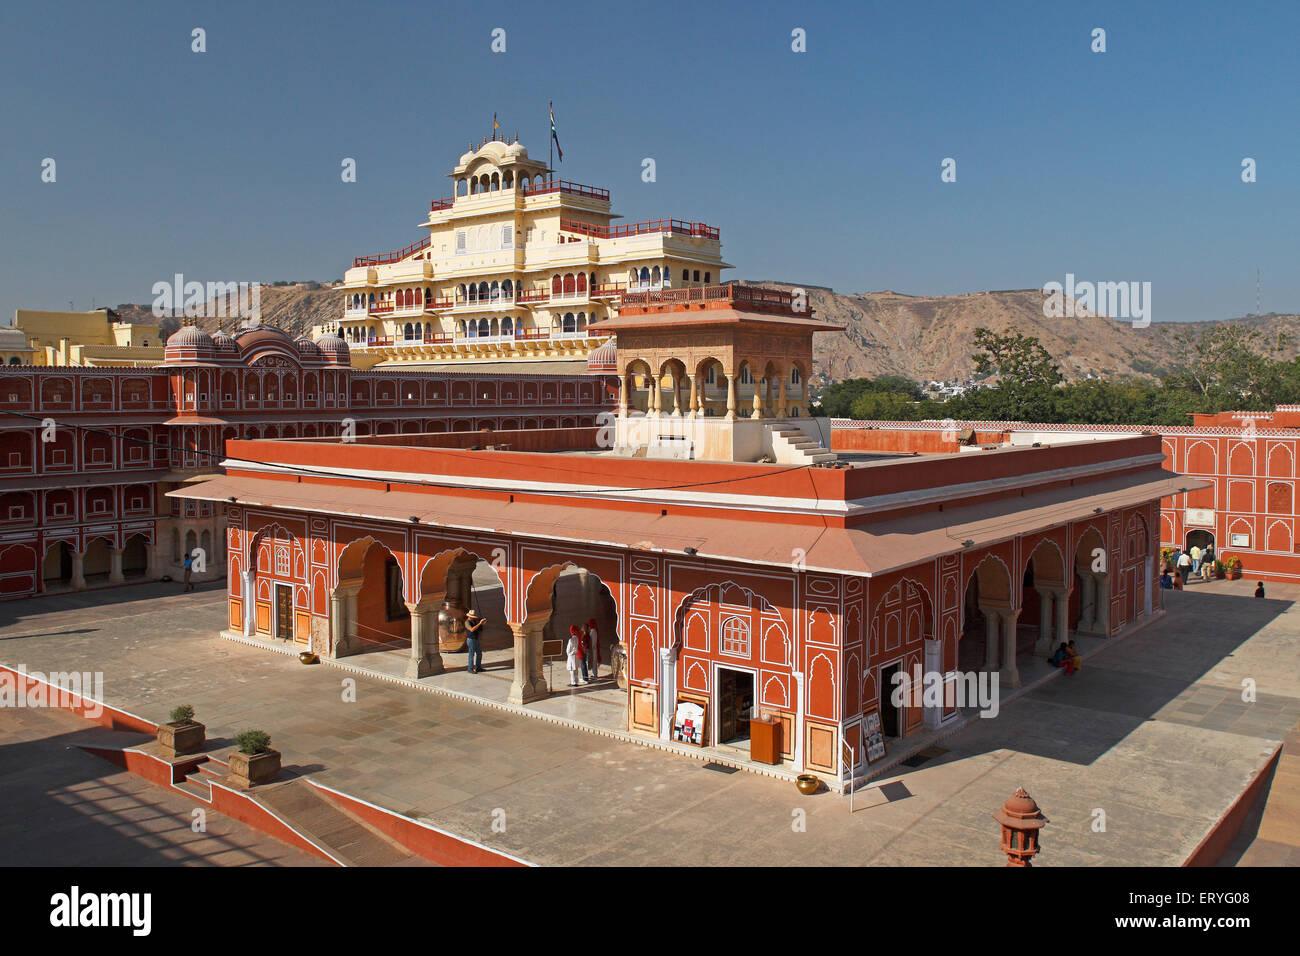 aad 170549 - Chandra Mahal in City Palace , Jaipur , Rajasthan , India - Stock Image